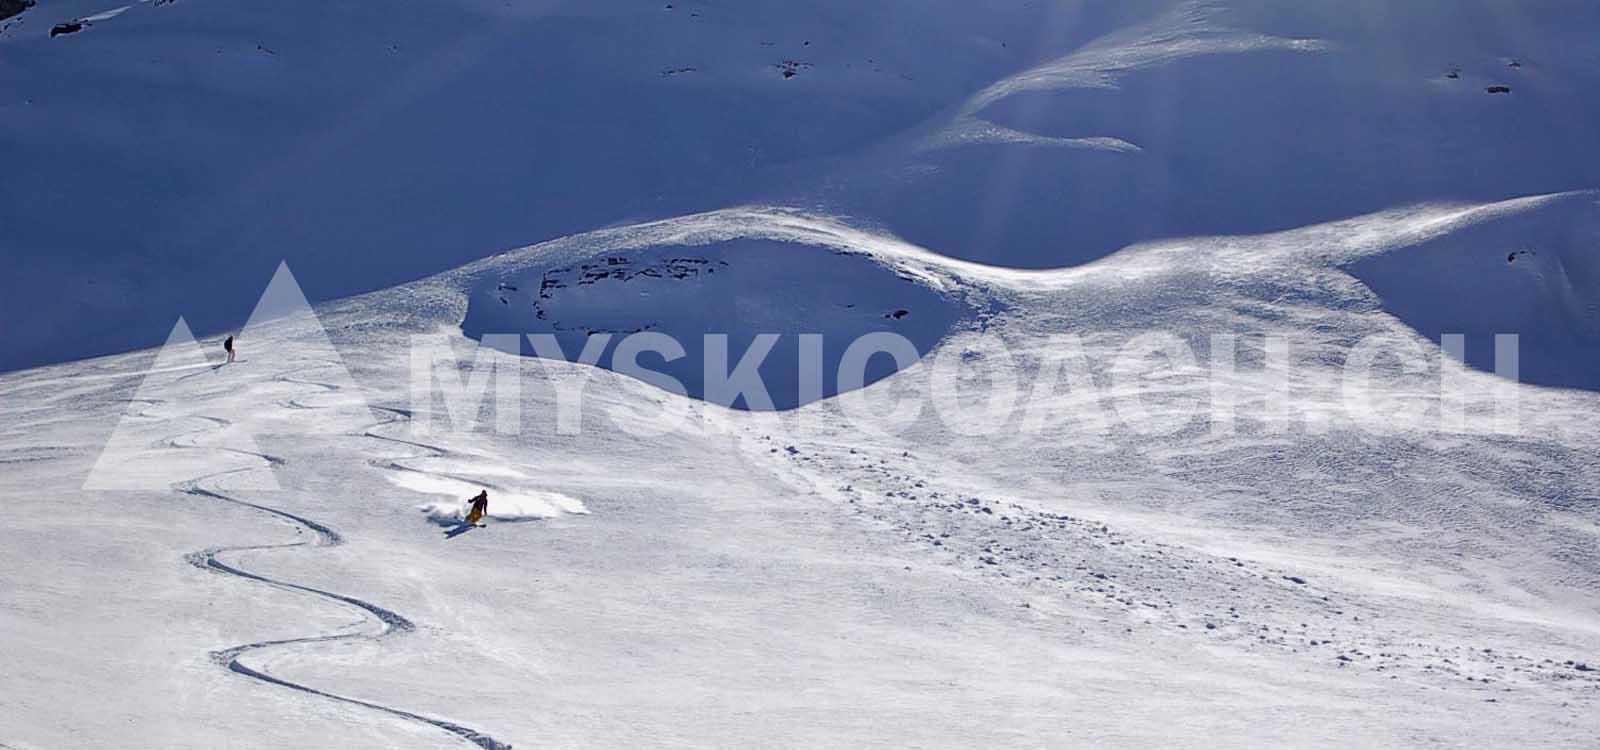 Avalanche course Valais ¦ Basics ¦ Snow Safety Myskicoach.ch